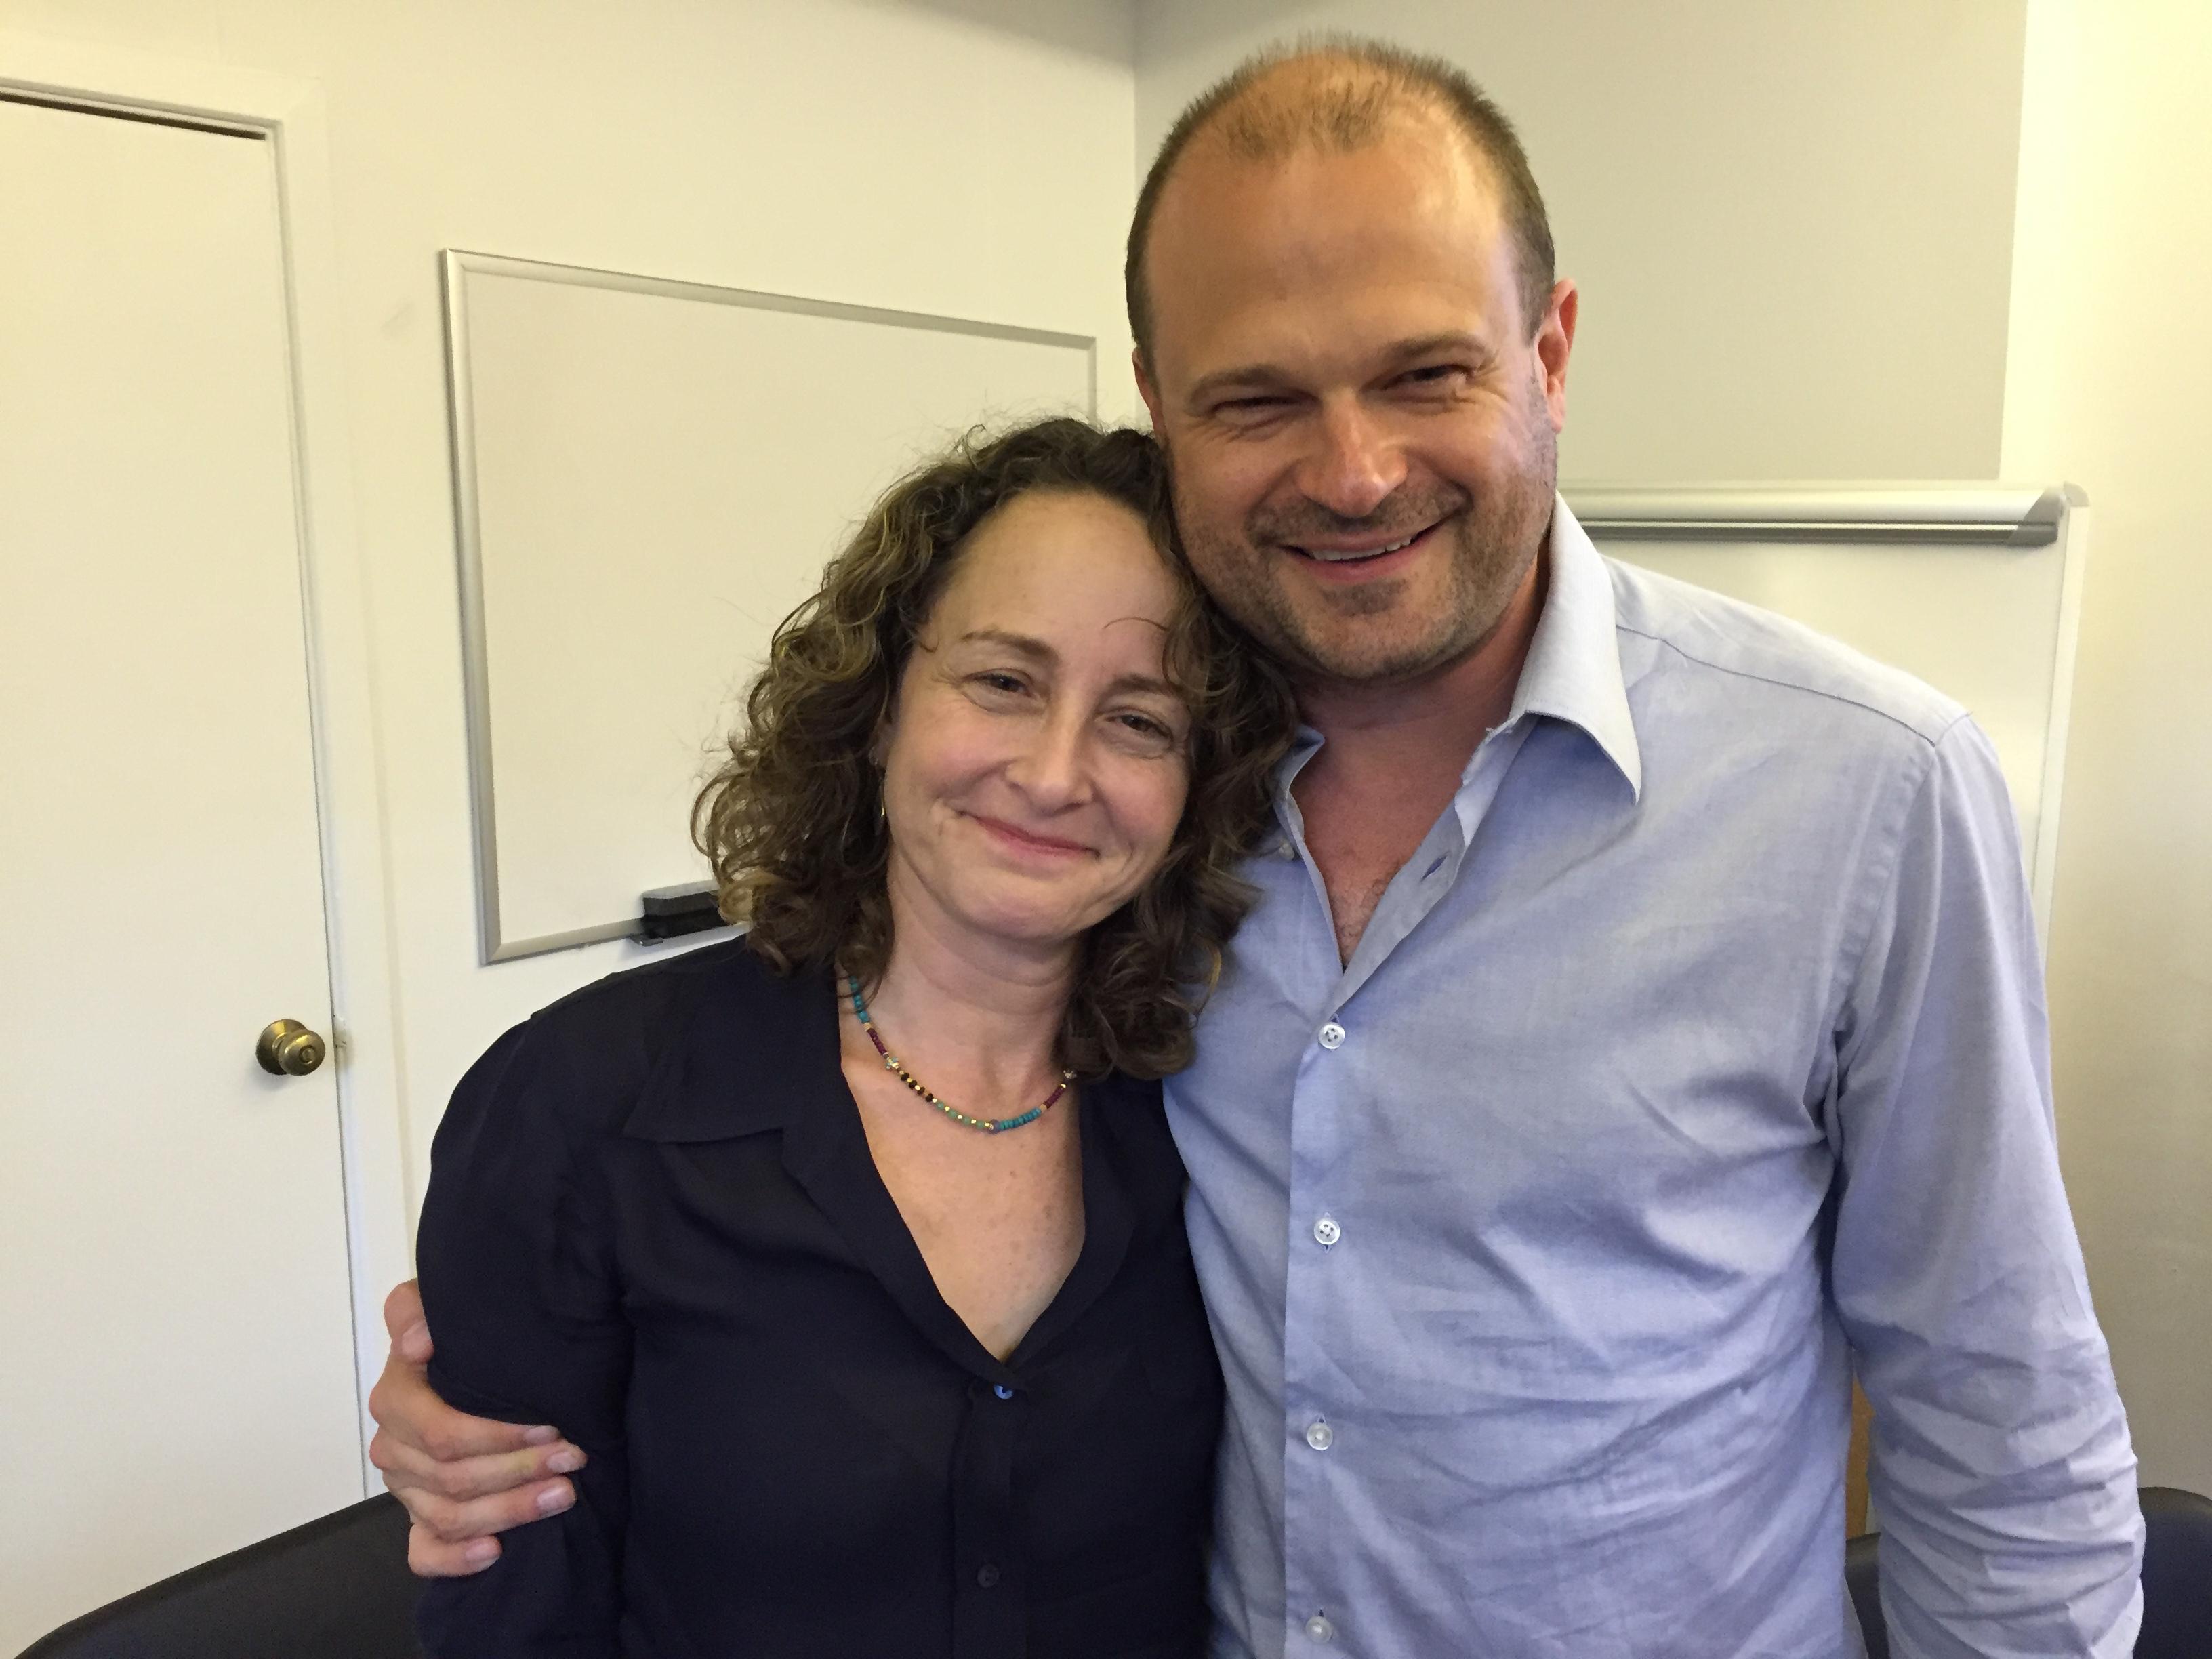 Nina Jacobson and Brad Simpson